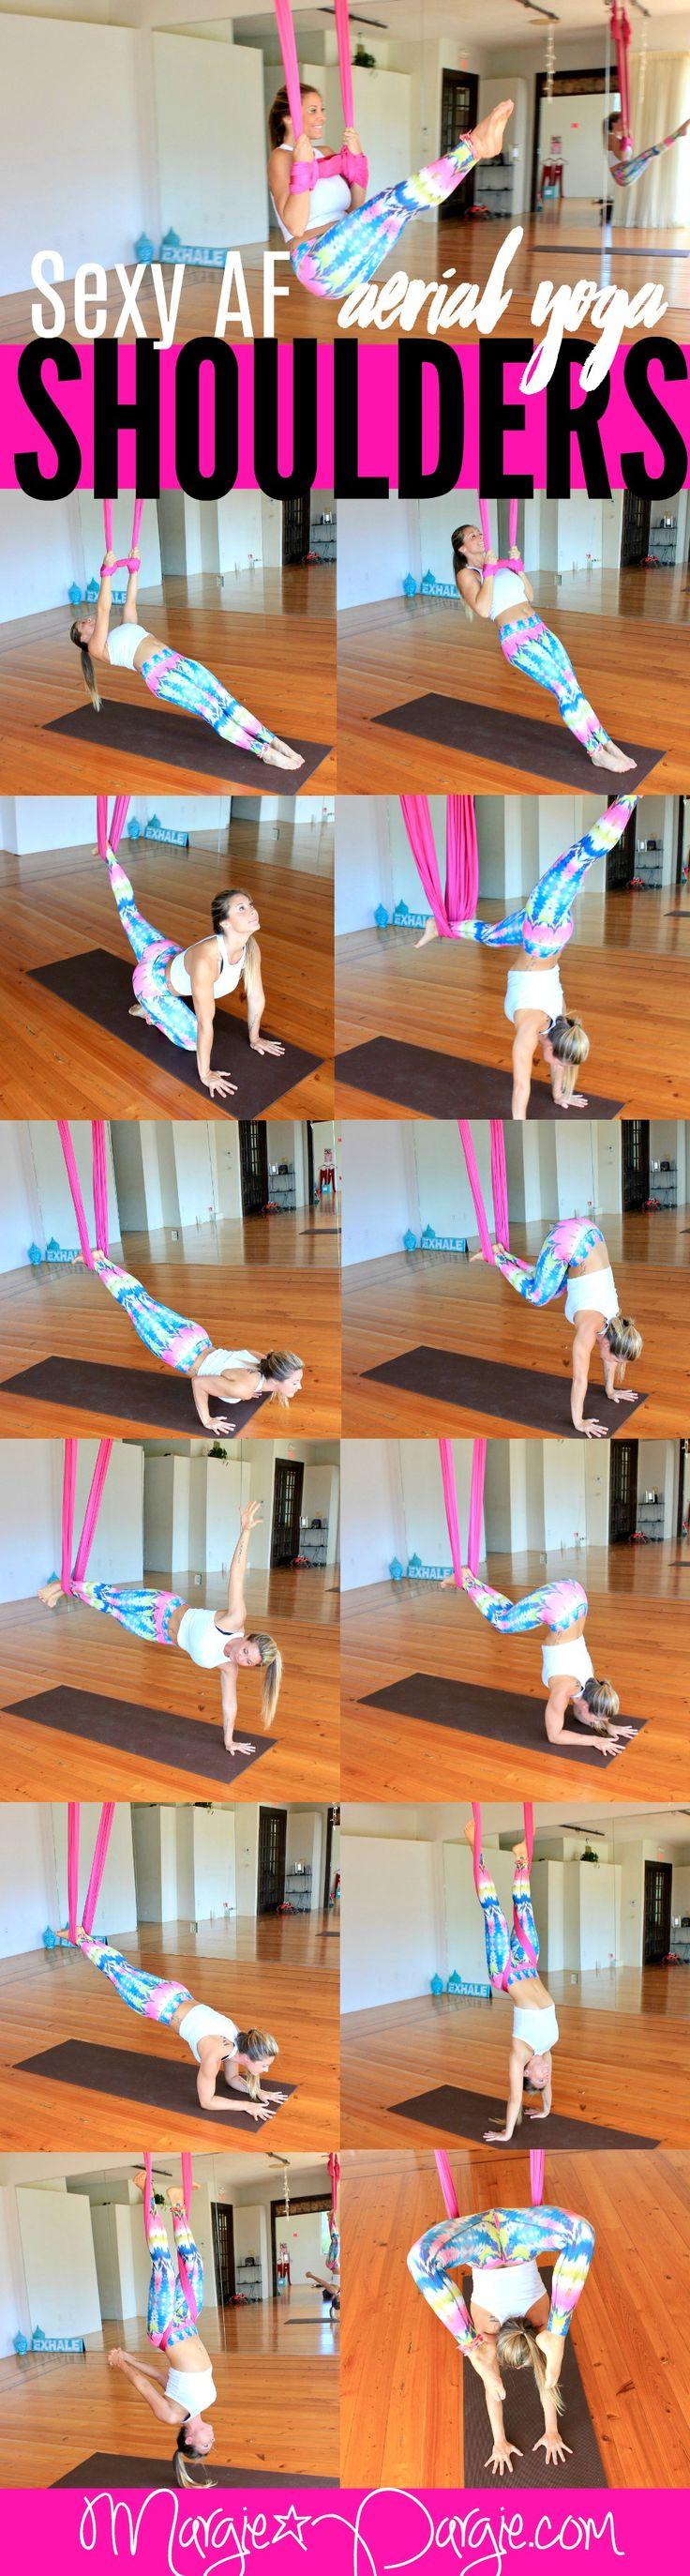 Aerial Yoga for Sexy AF Shoulders